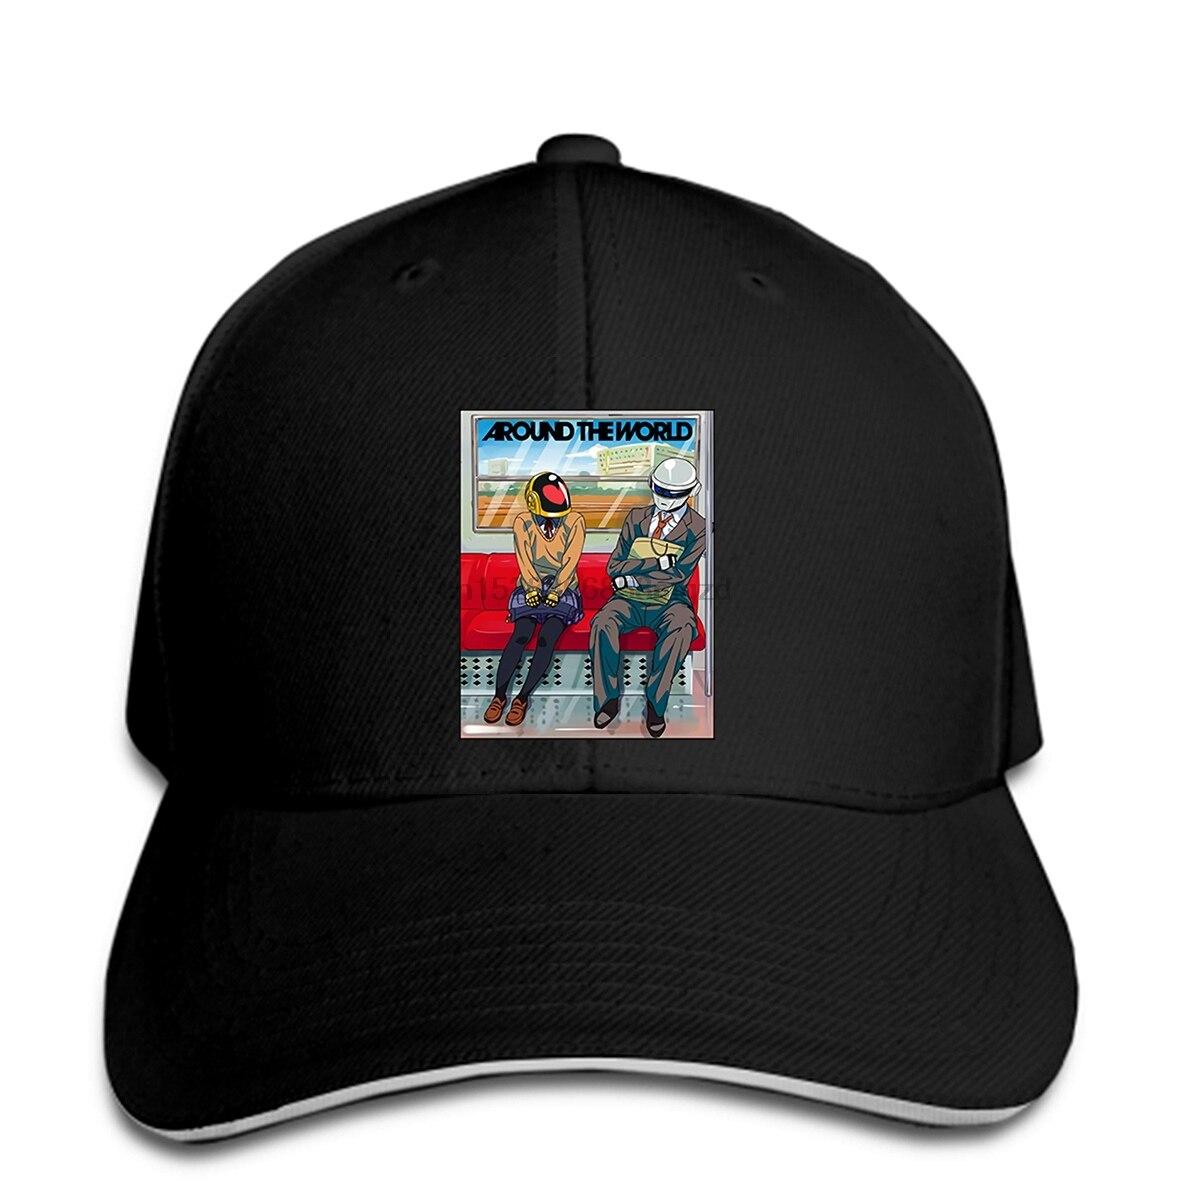 Daft Punk Around The World Hat Snapback Cap Women Hat Peaked